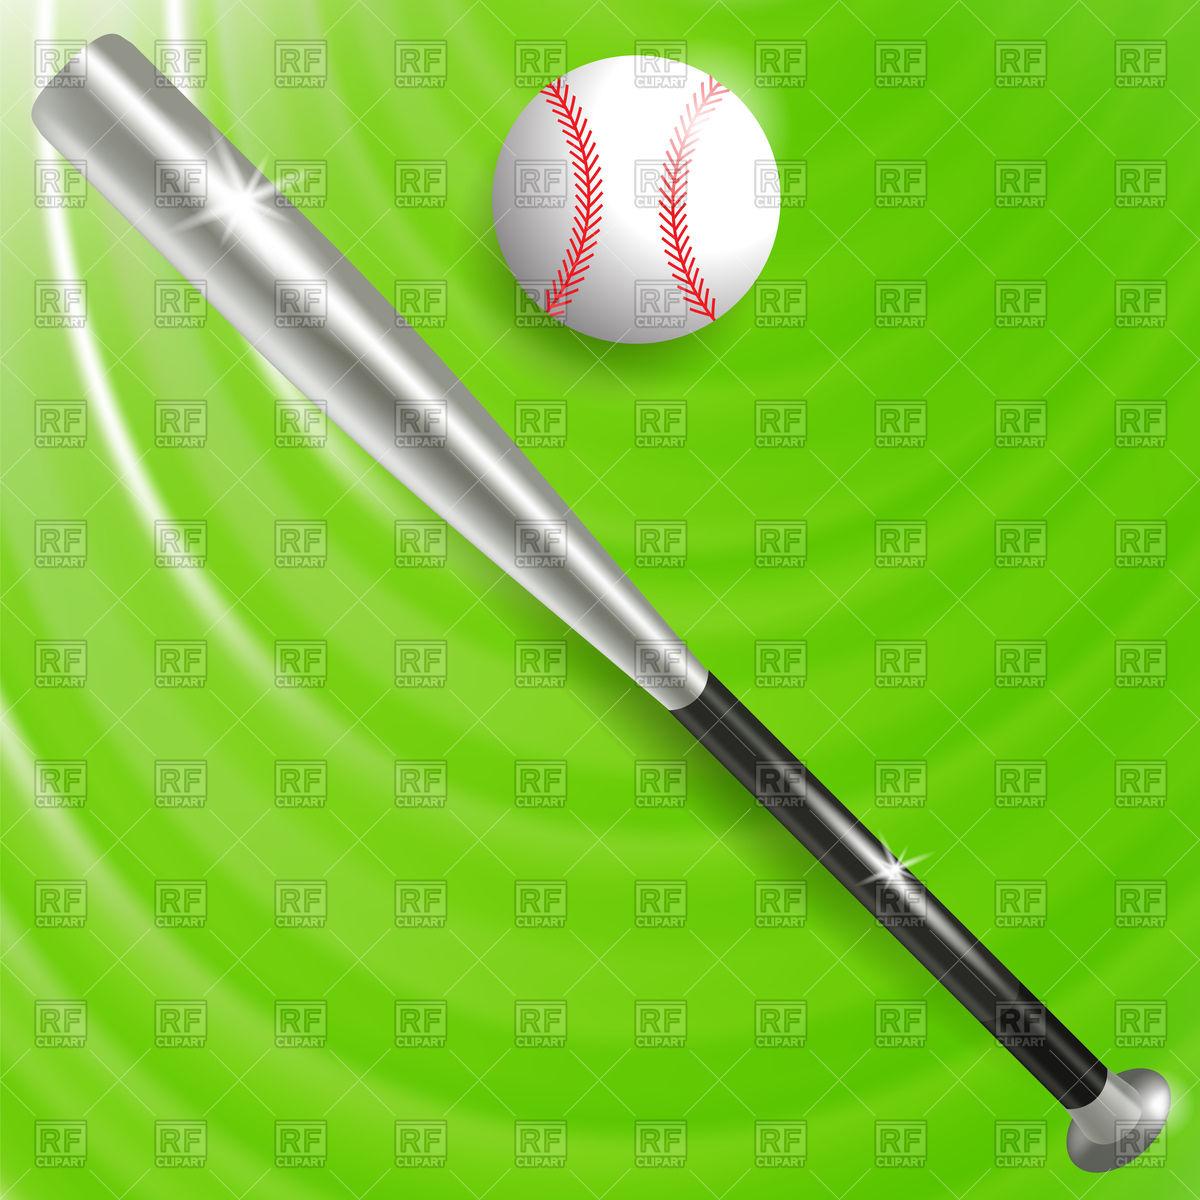 1200x1200 Baseball Bat And Ball Background Vector Image Vector Artwork Of